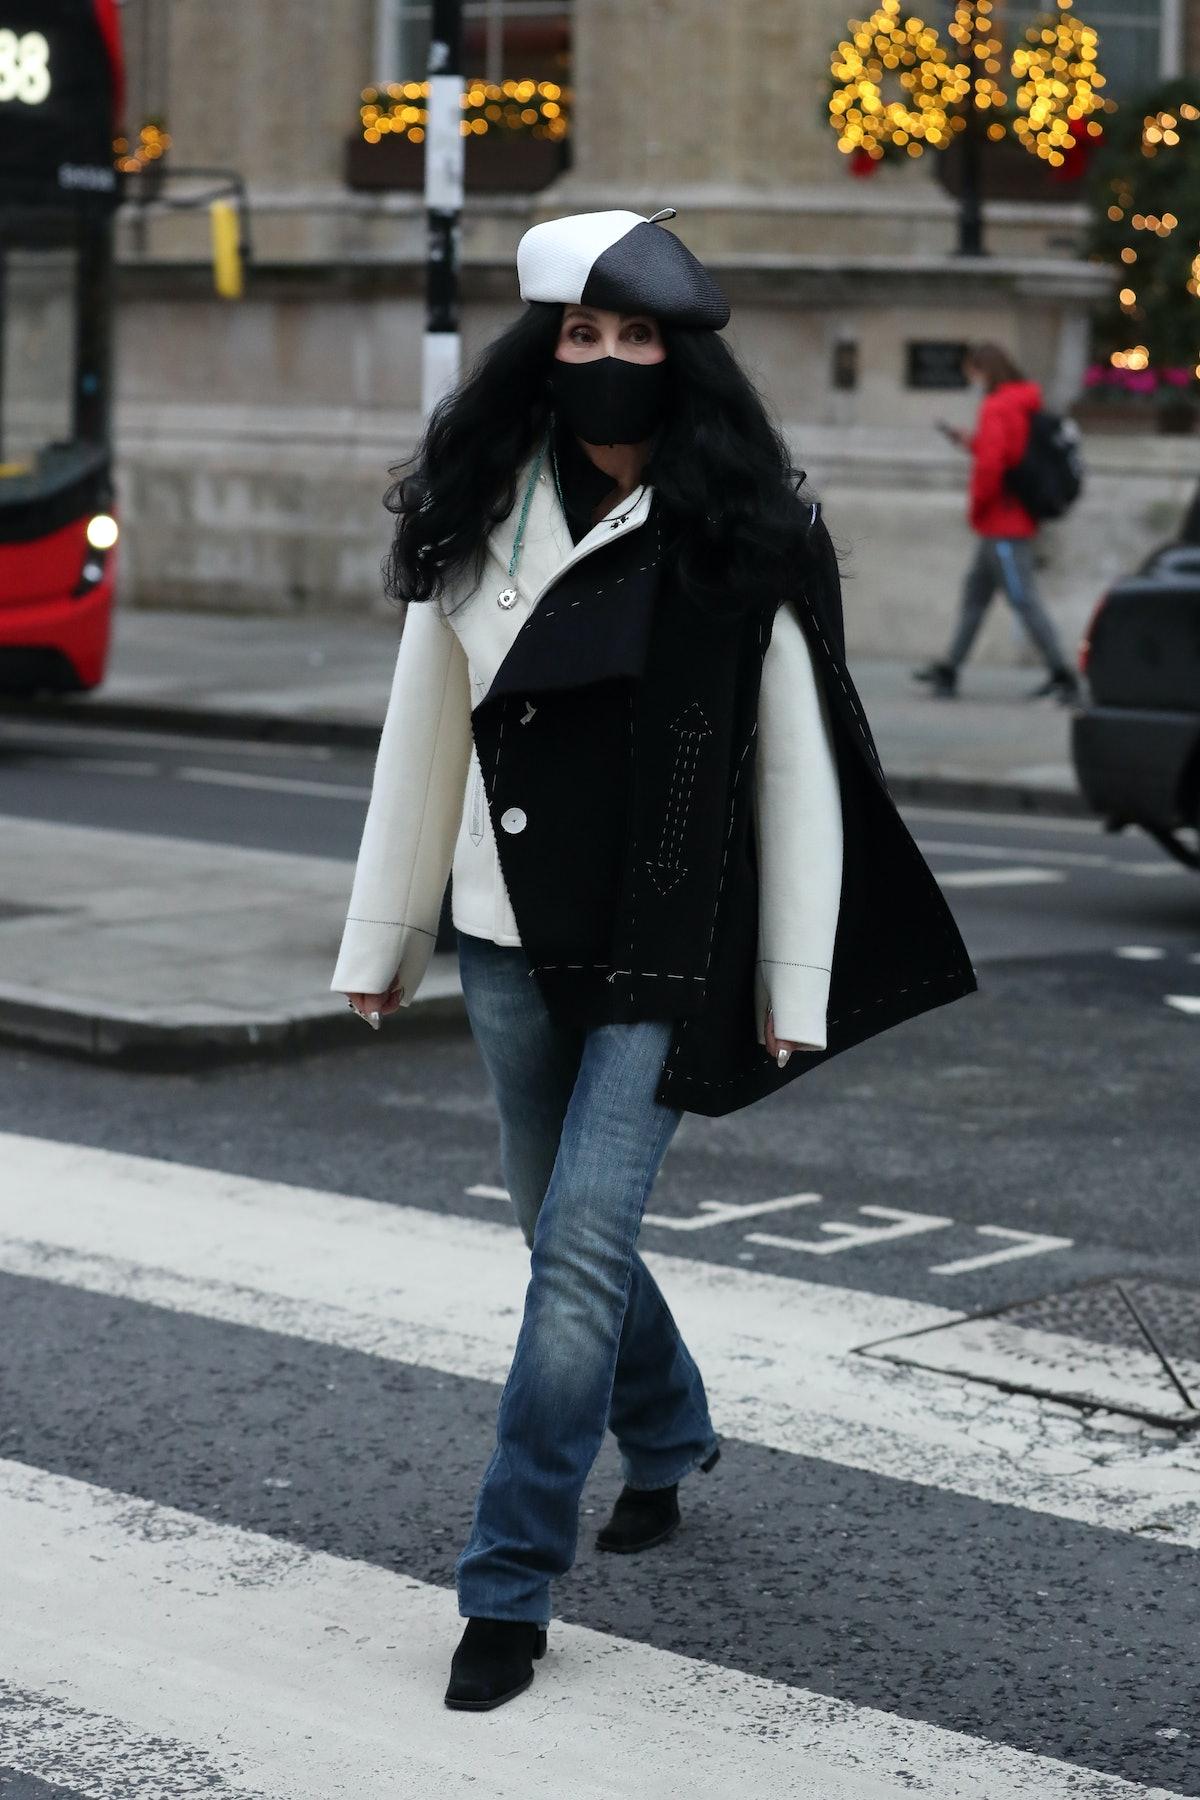 Cher crossing a street